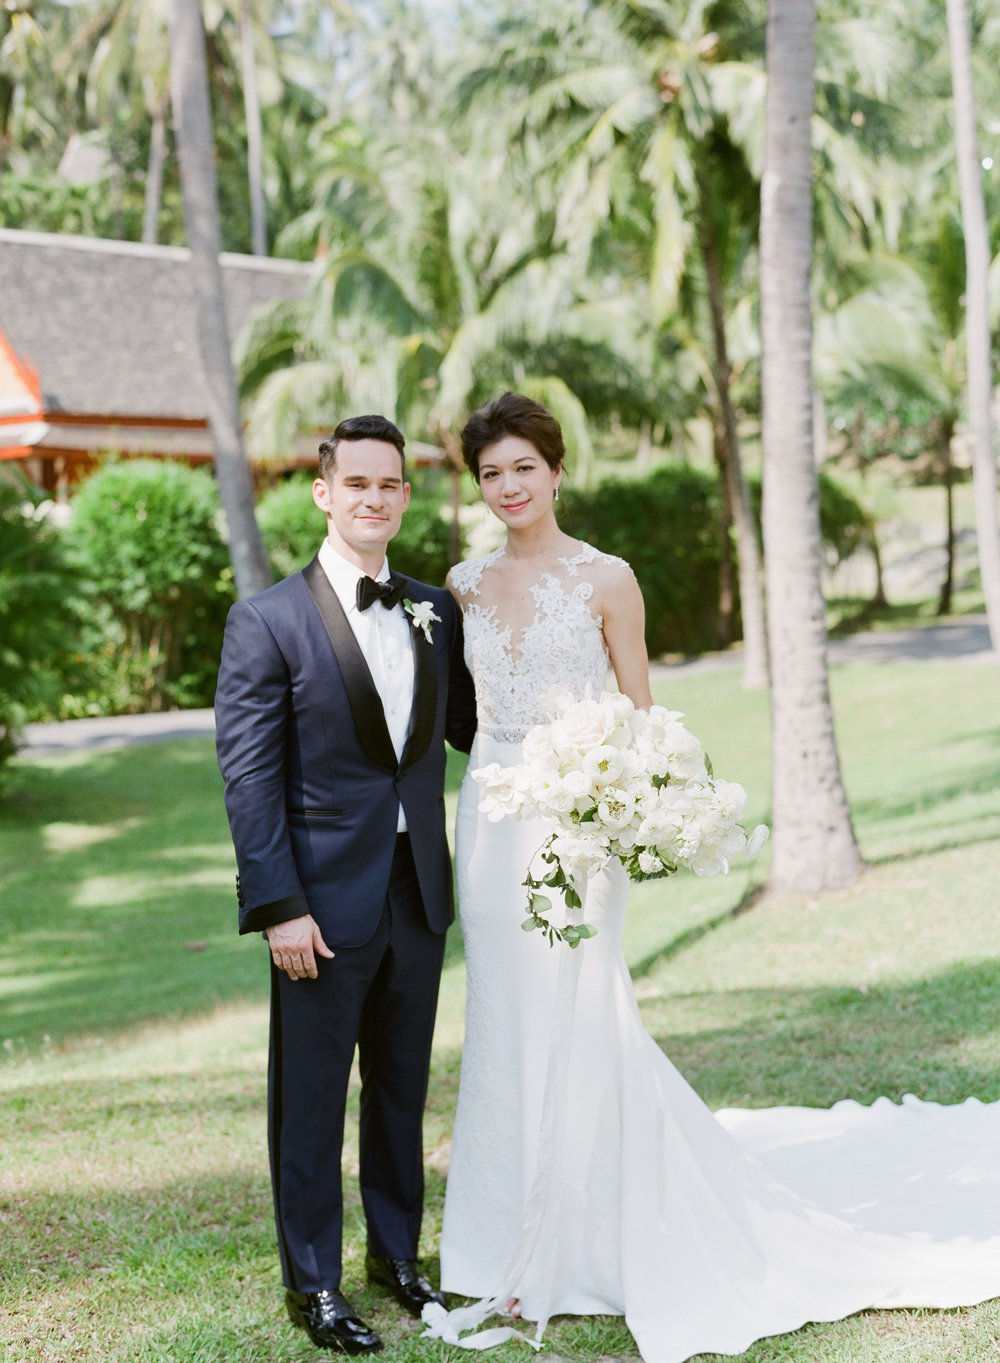 Stacy-Brad-Wedding-Film-0300.JPG